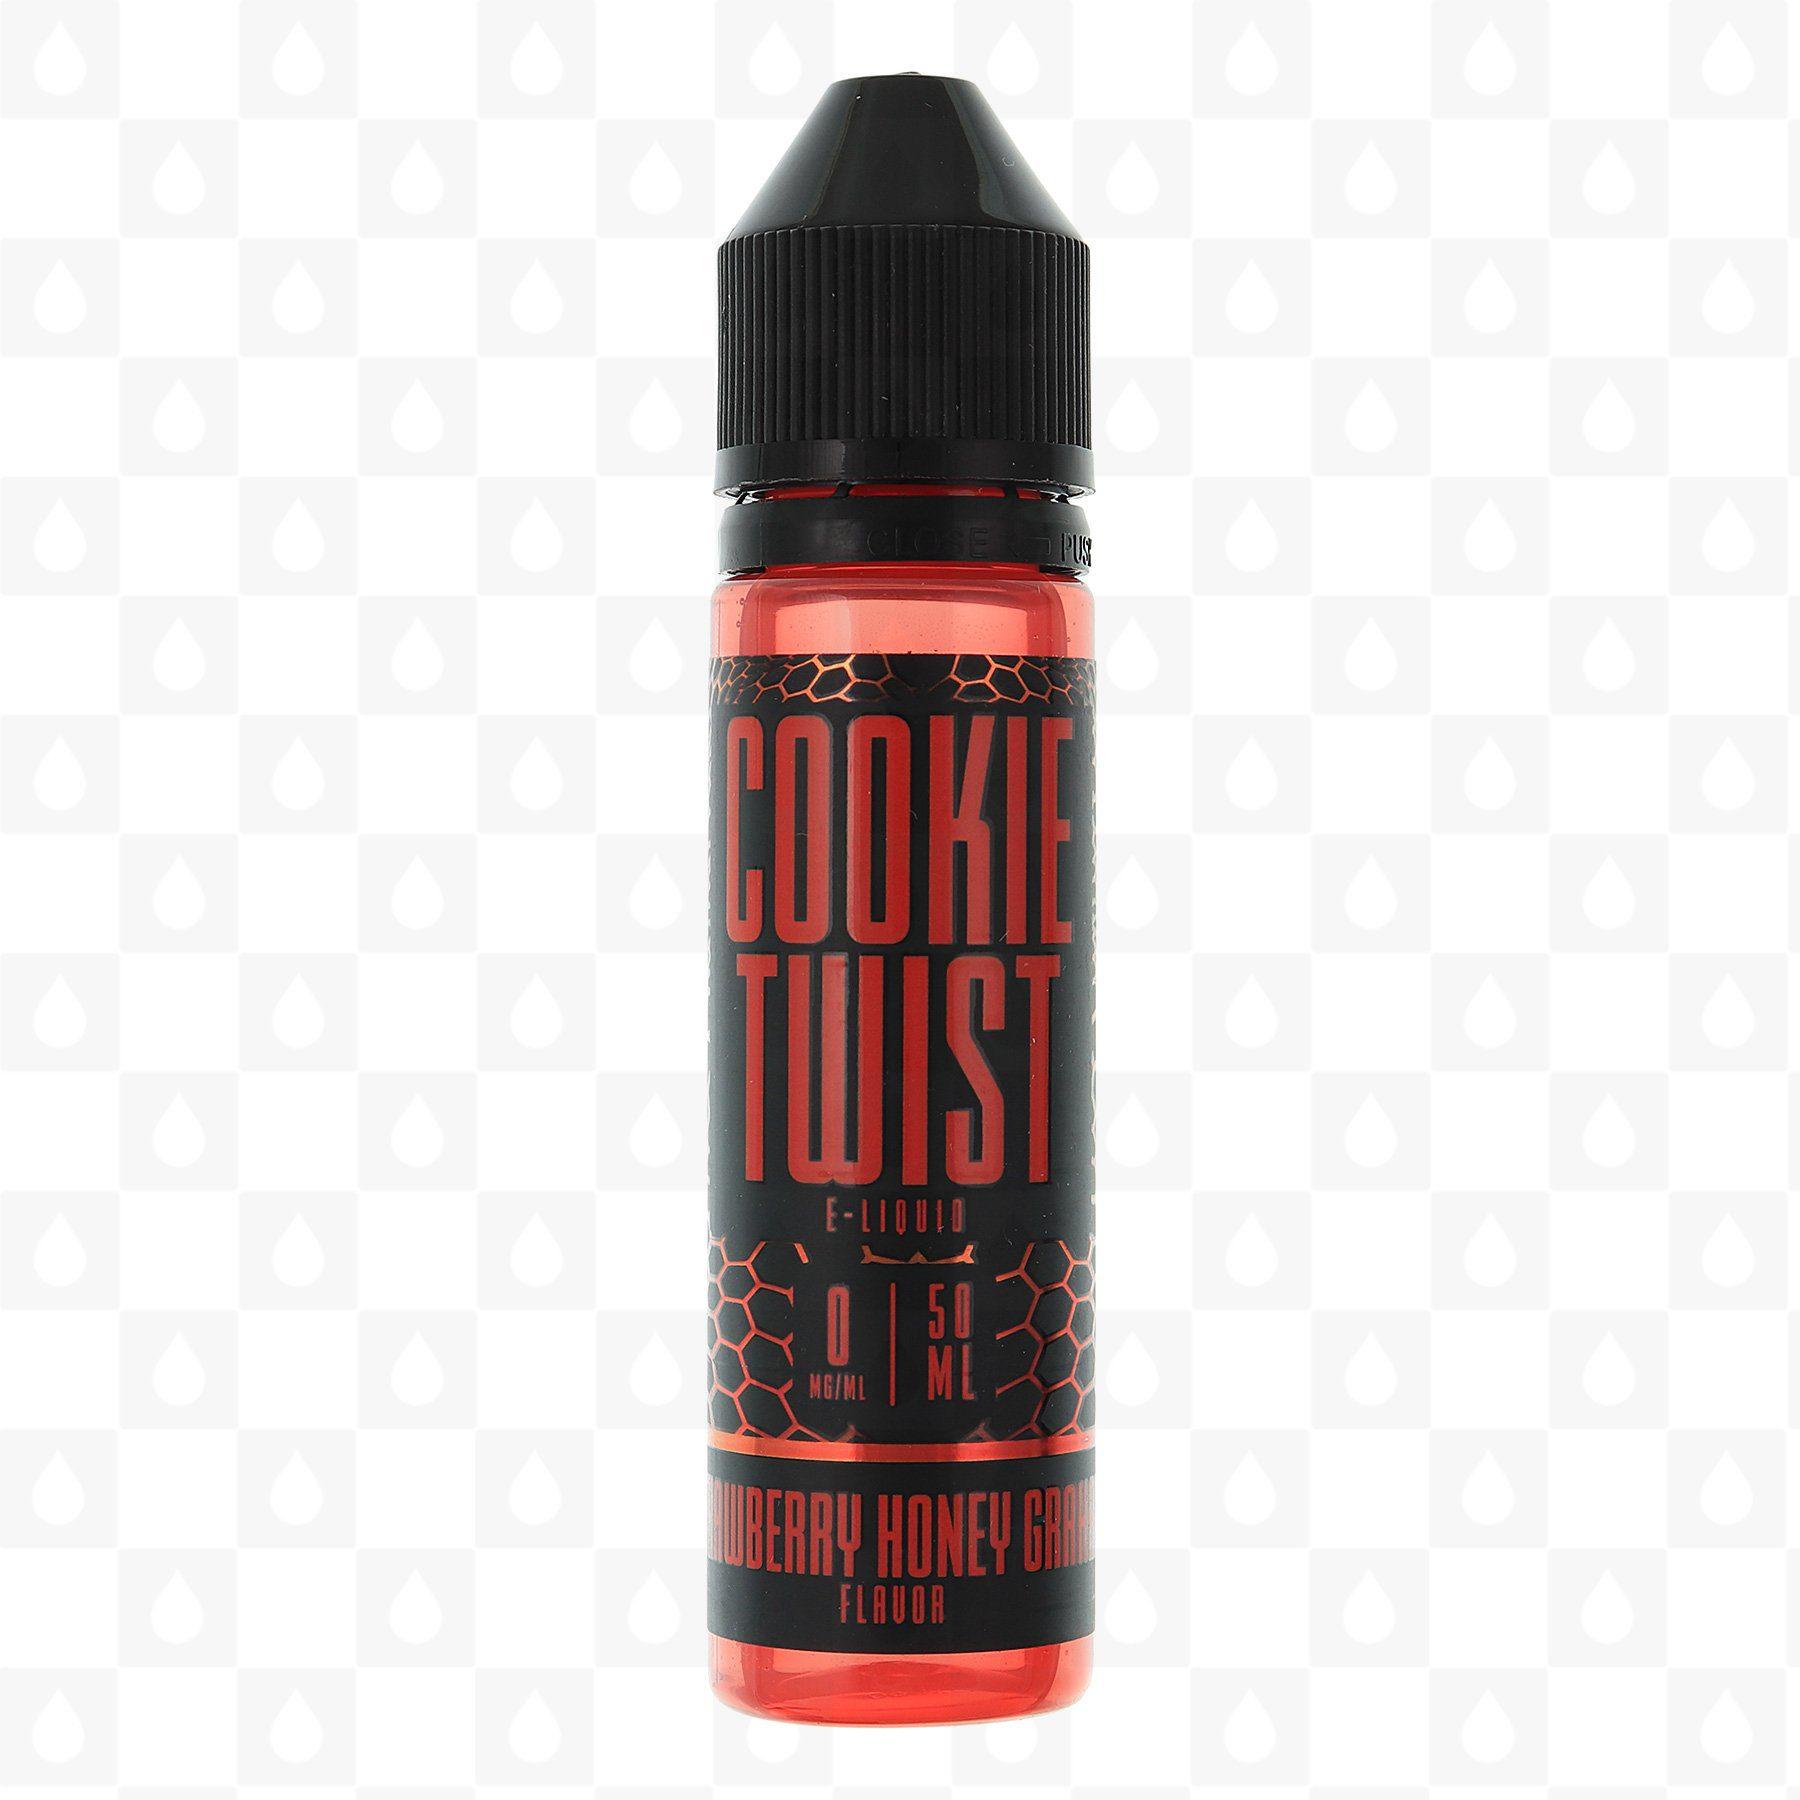 Cookie Twist Strawberry Honey Graham 50ml Shortfill E-Liquid